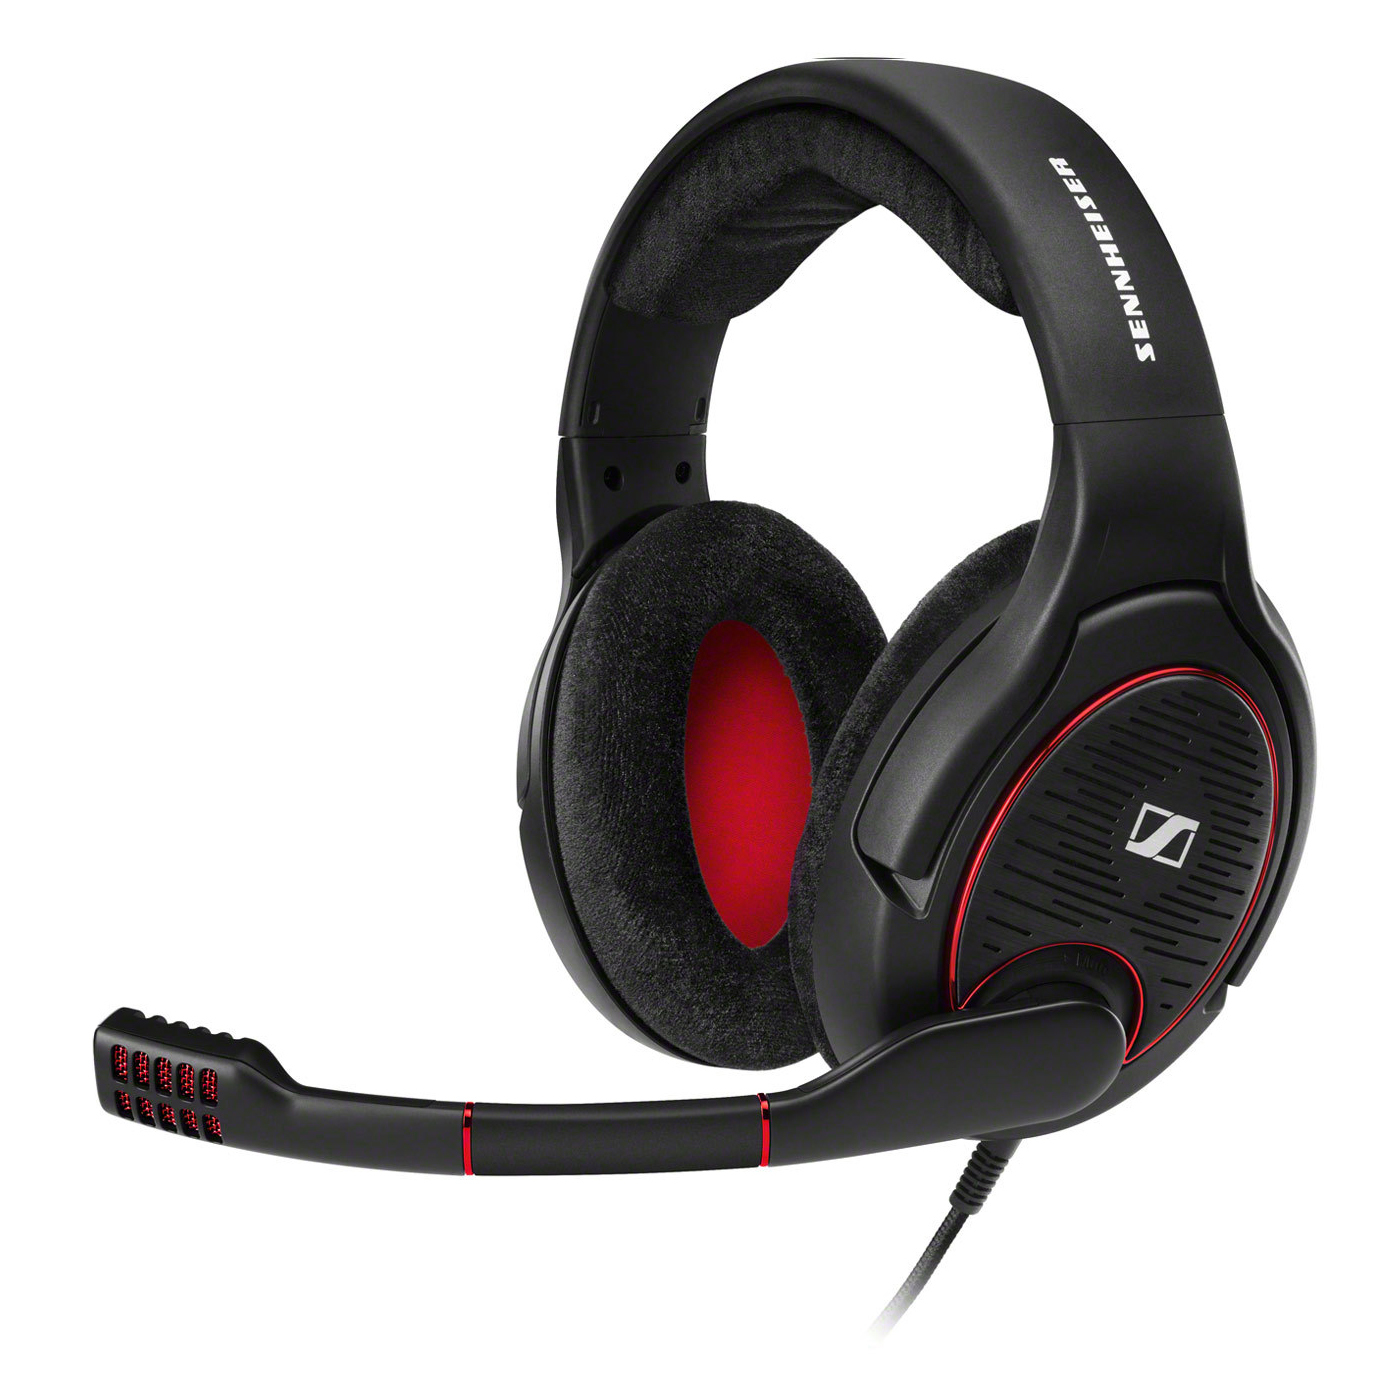 Sennheiser GAME ONE Gaming Headset, Black, 00615104257443